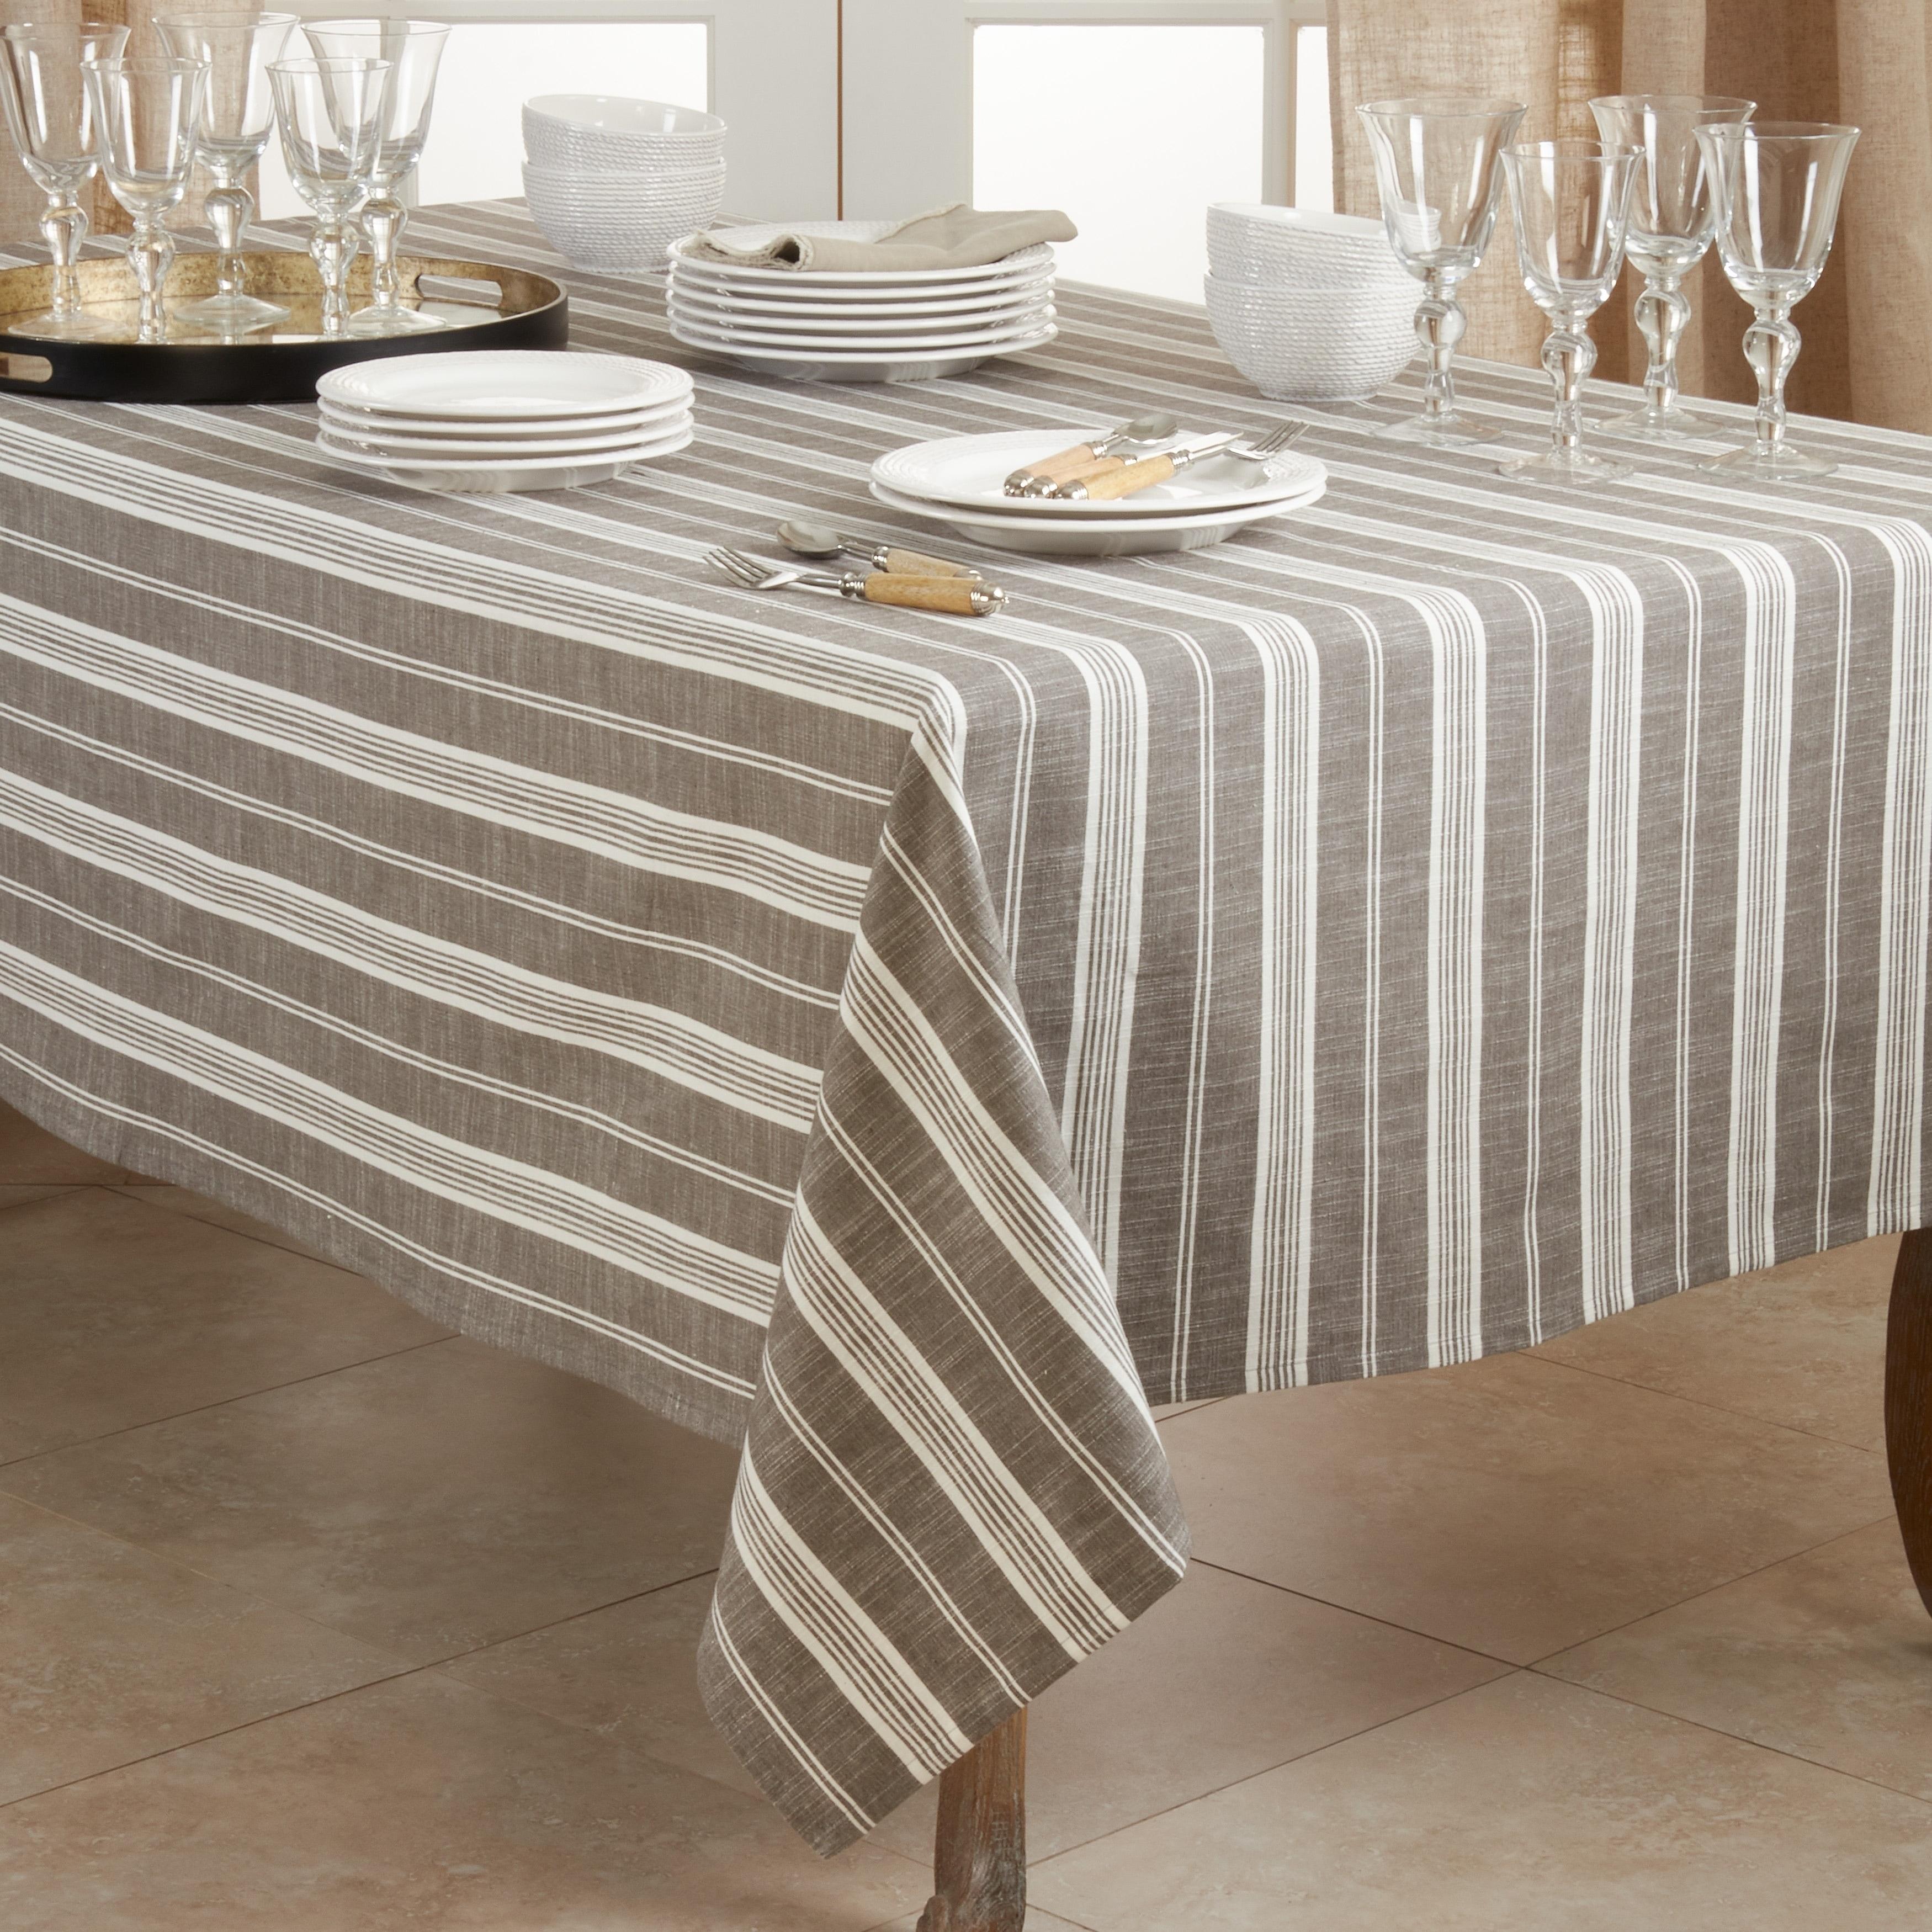 Tablecloth Rectangle Ready to Ship: Striped Tablecloth Green and brown striped tablecloth Scandinavian design Linen Table Cloth